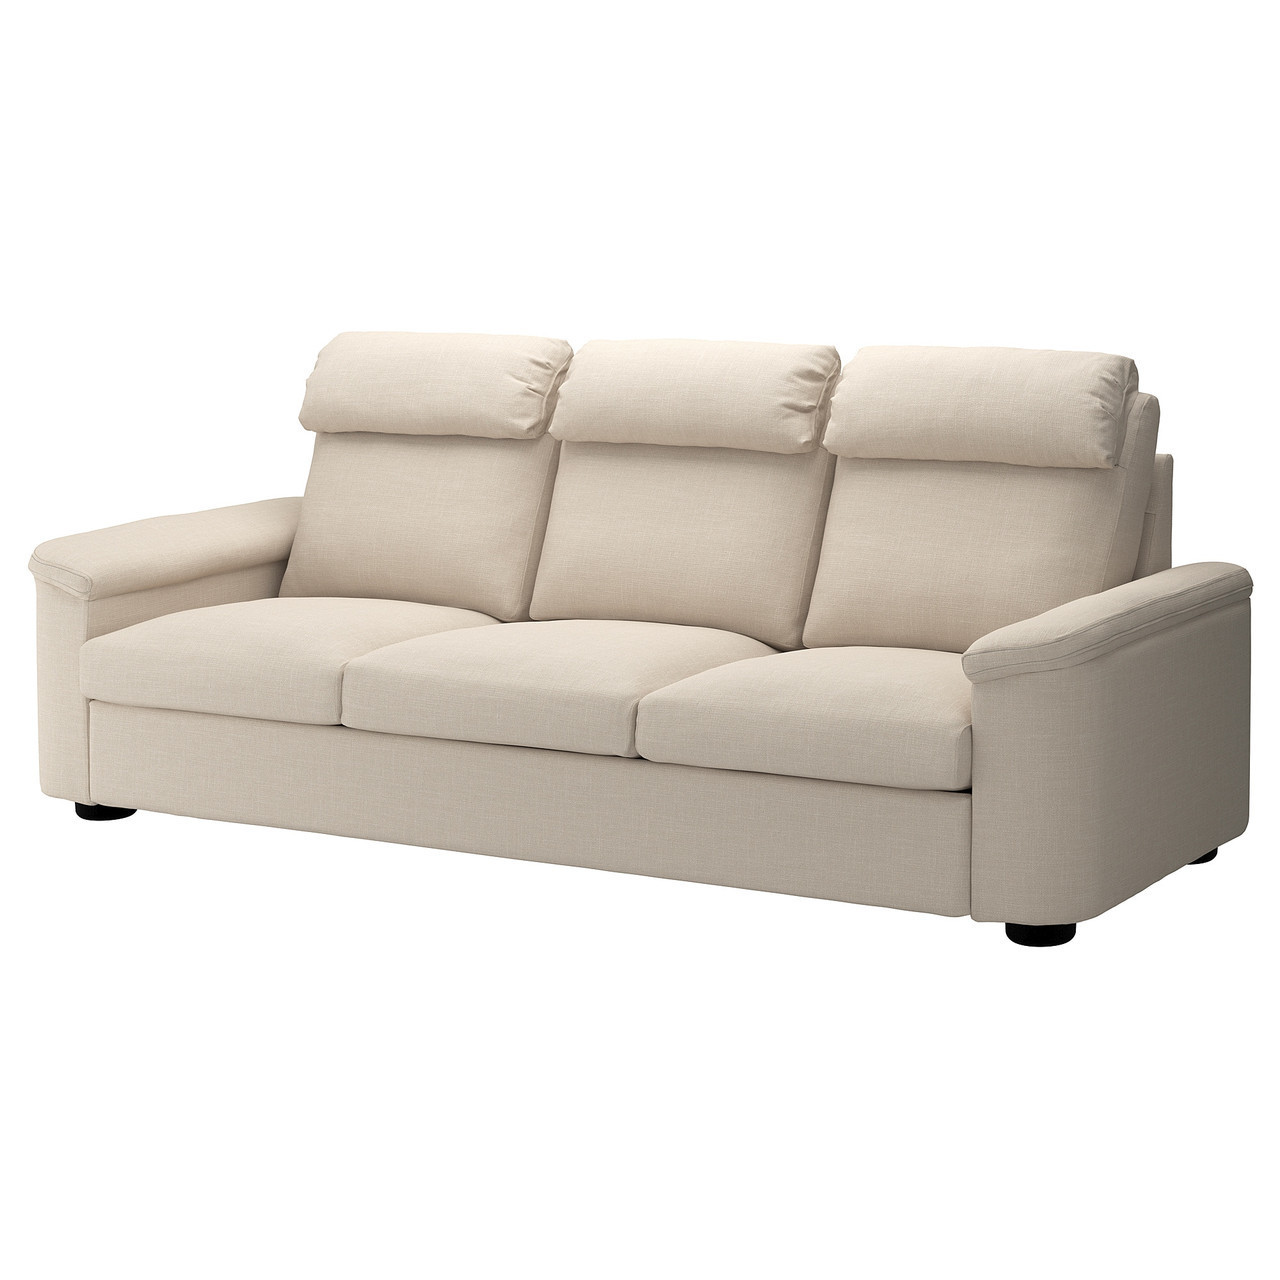 Диван IKEA LIDHULT 3-местный Gassebol светло-бежевый 492.569.71